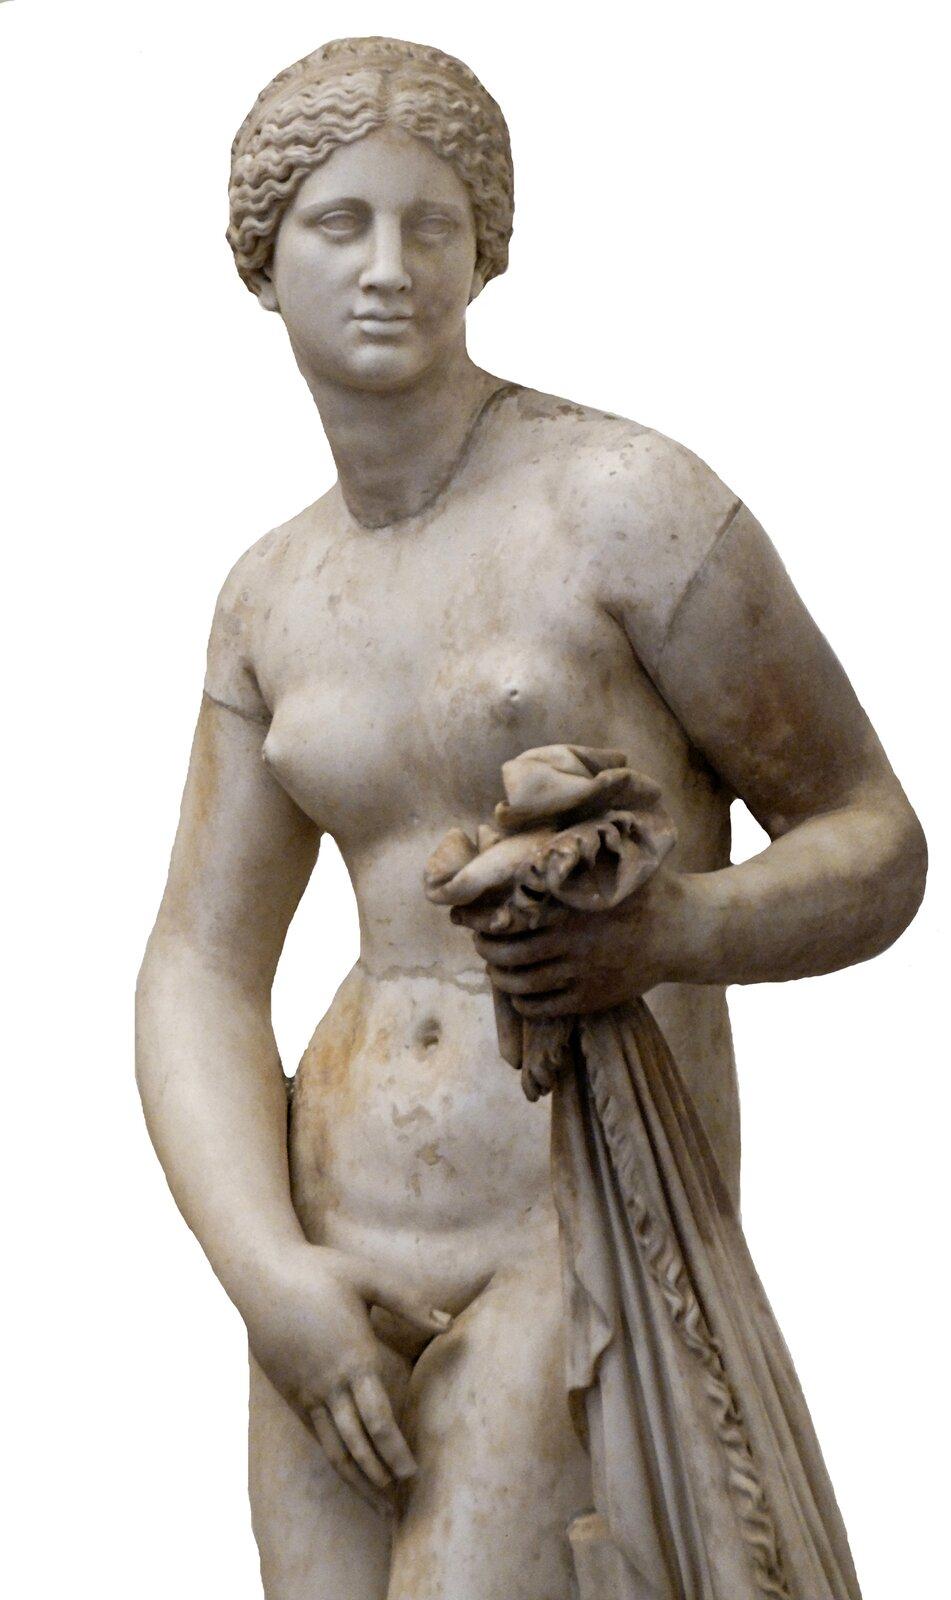 Afrodyta knidyjska Źródło: Praksyteles, Afrodyta knidyjska, ok. 360 p.n.e., marmurowa kopia rzymska, Museo Nazionale Romano (Palazzo Altemps), licencja: CC BY 2.0.